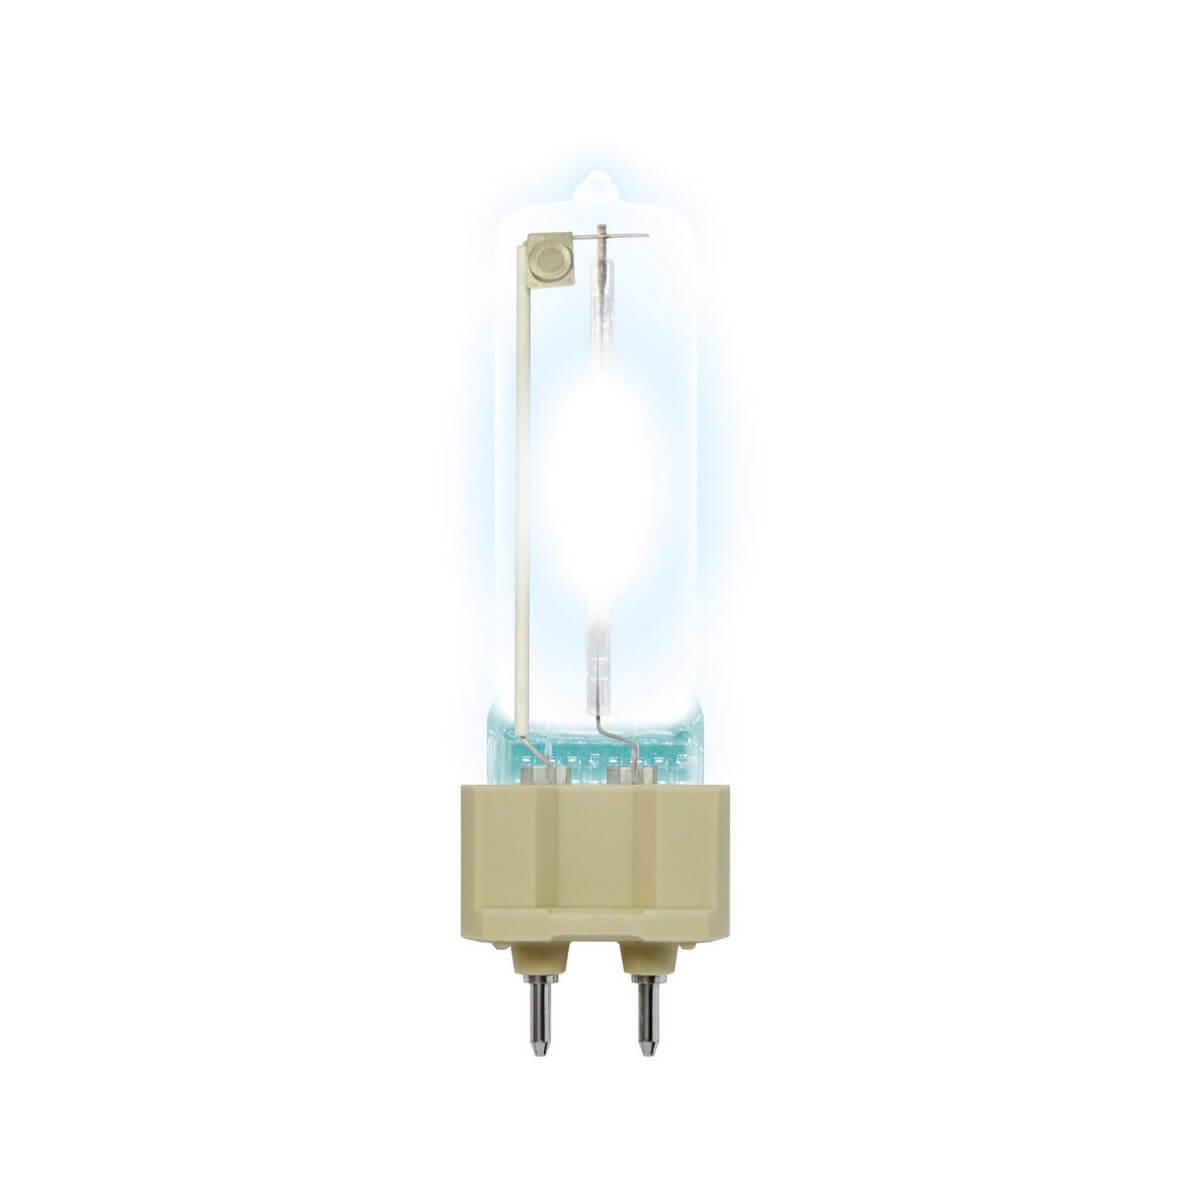 Лампочка Uniel MH-SE-150/3300/G12 MH-SE